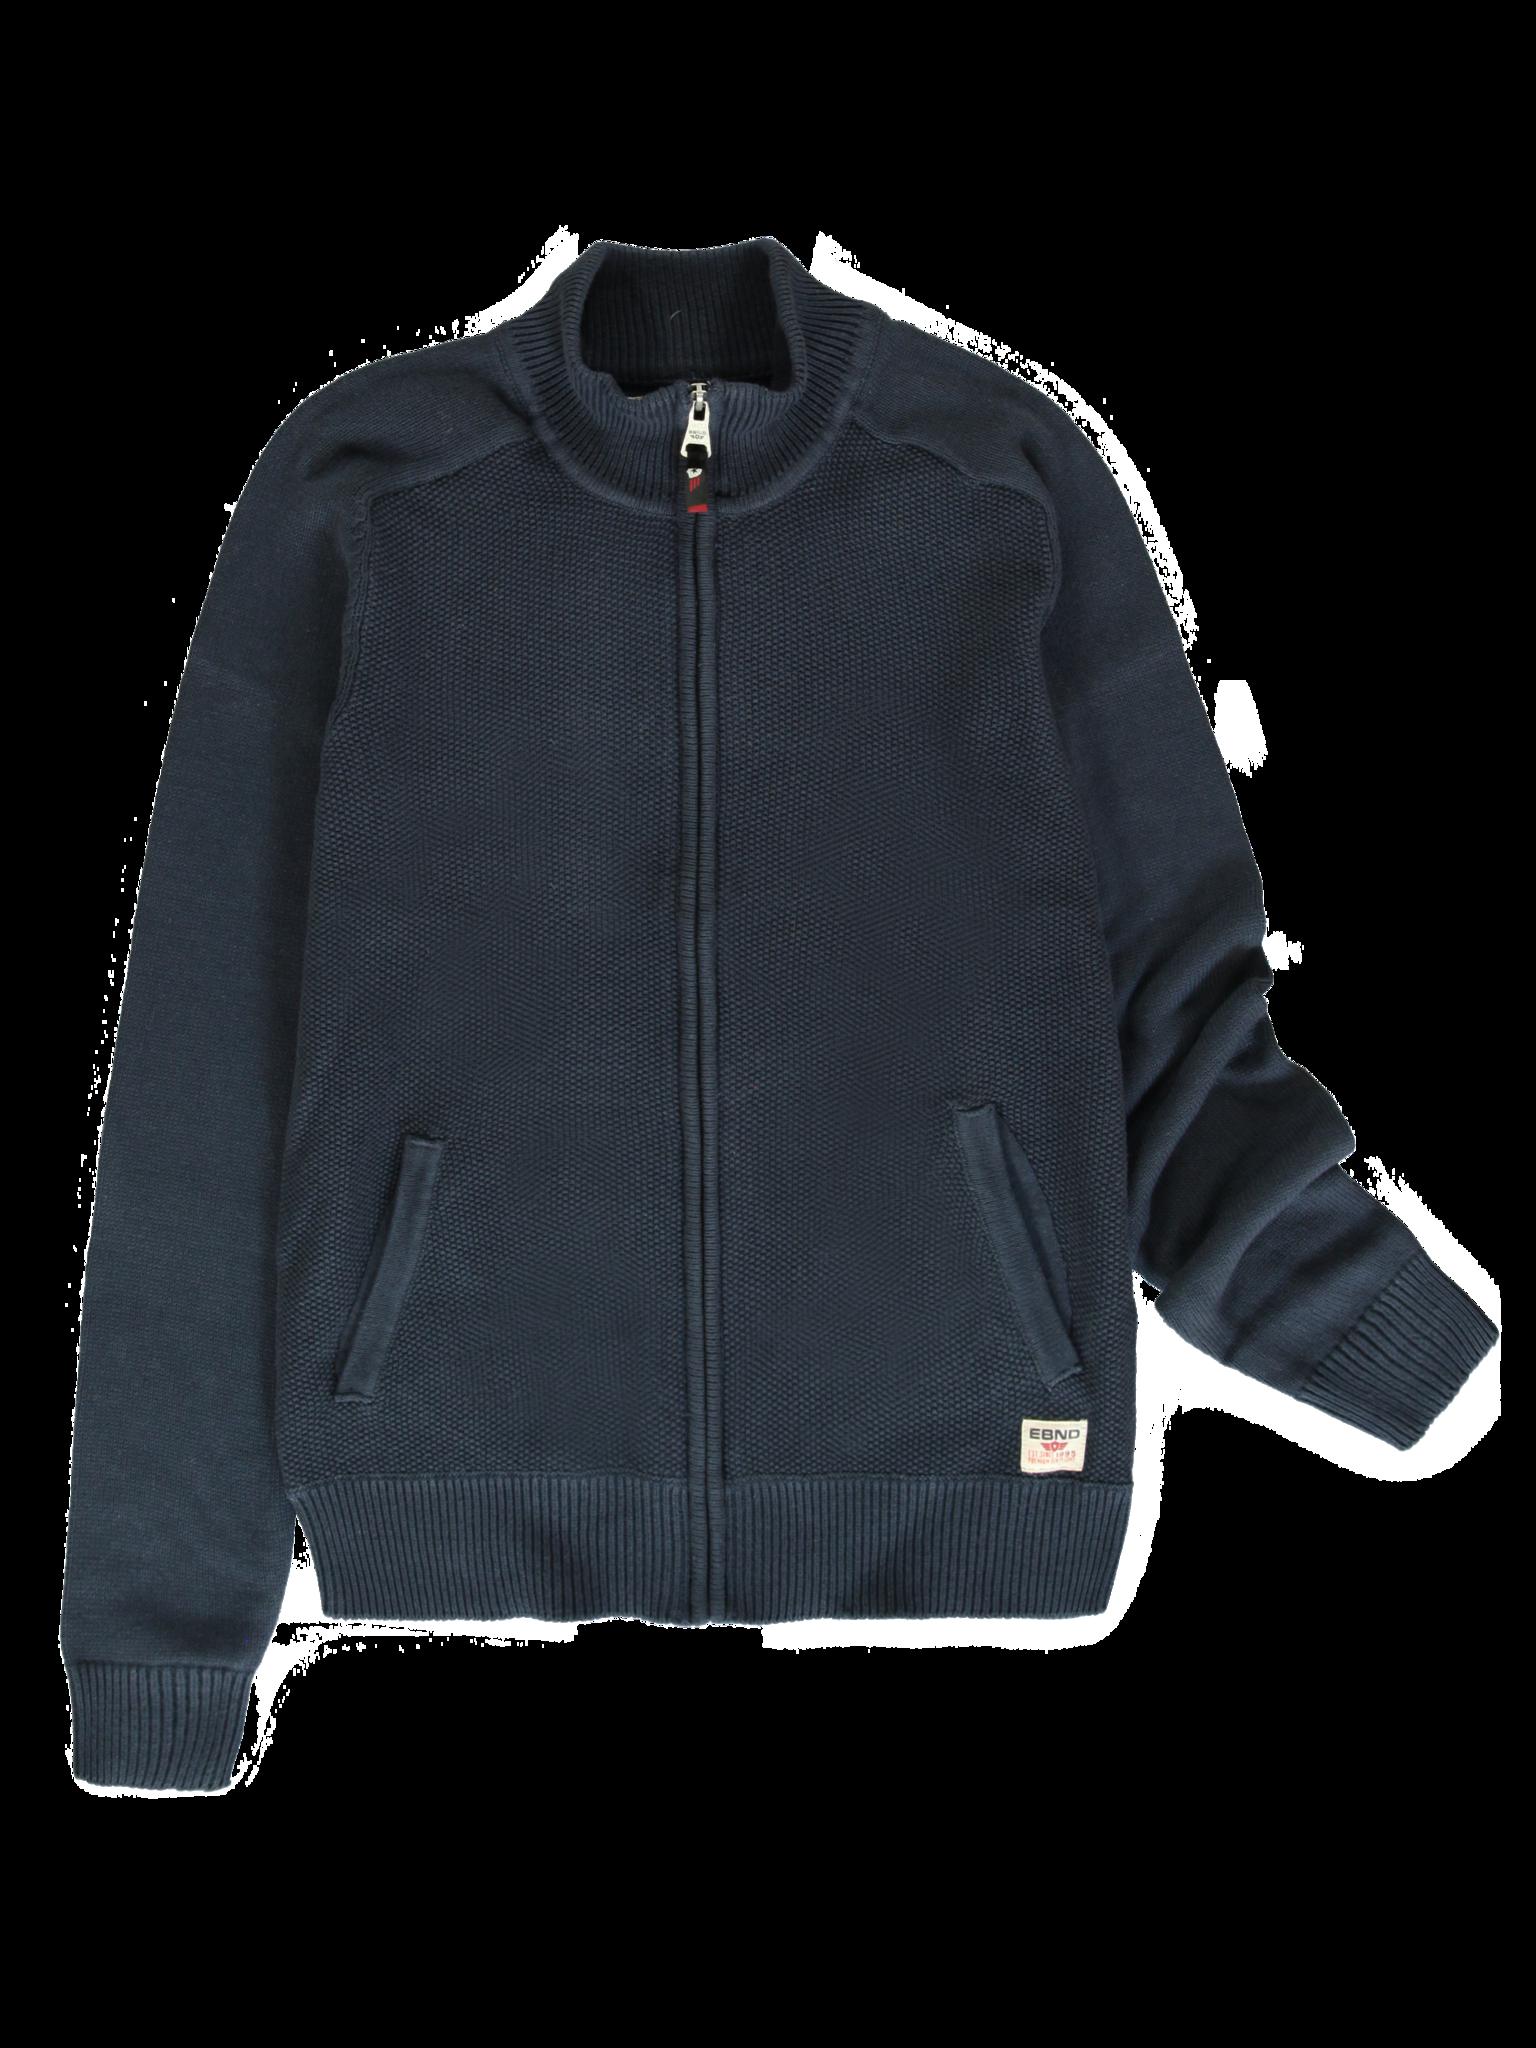 All Brands | Winterproducts Men | Cardigan Knitwear | 18 pcs/box